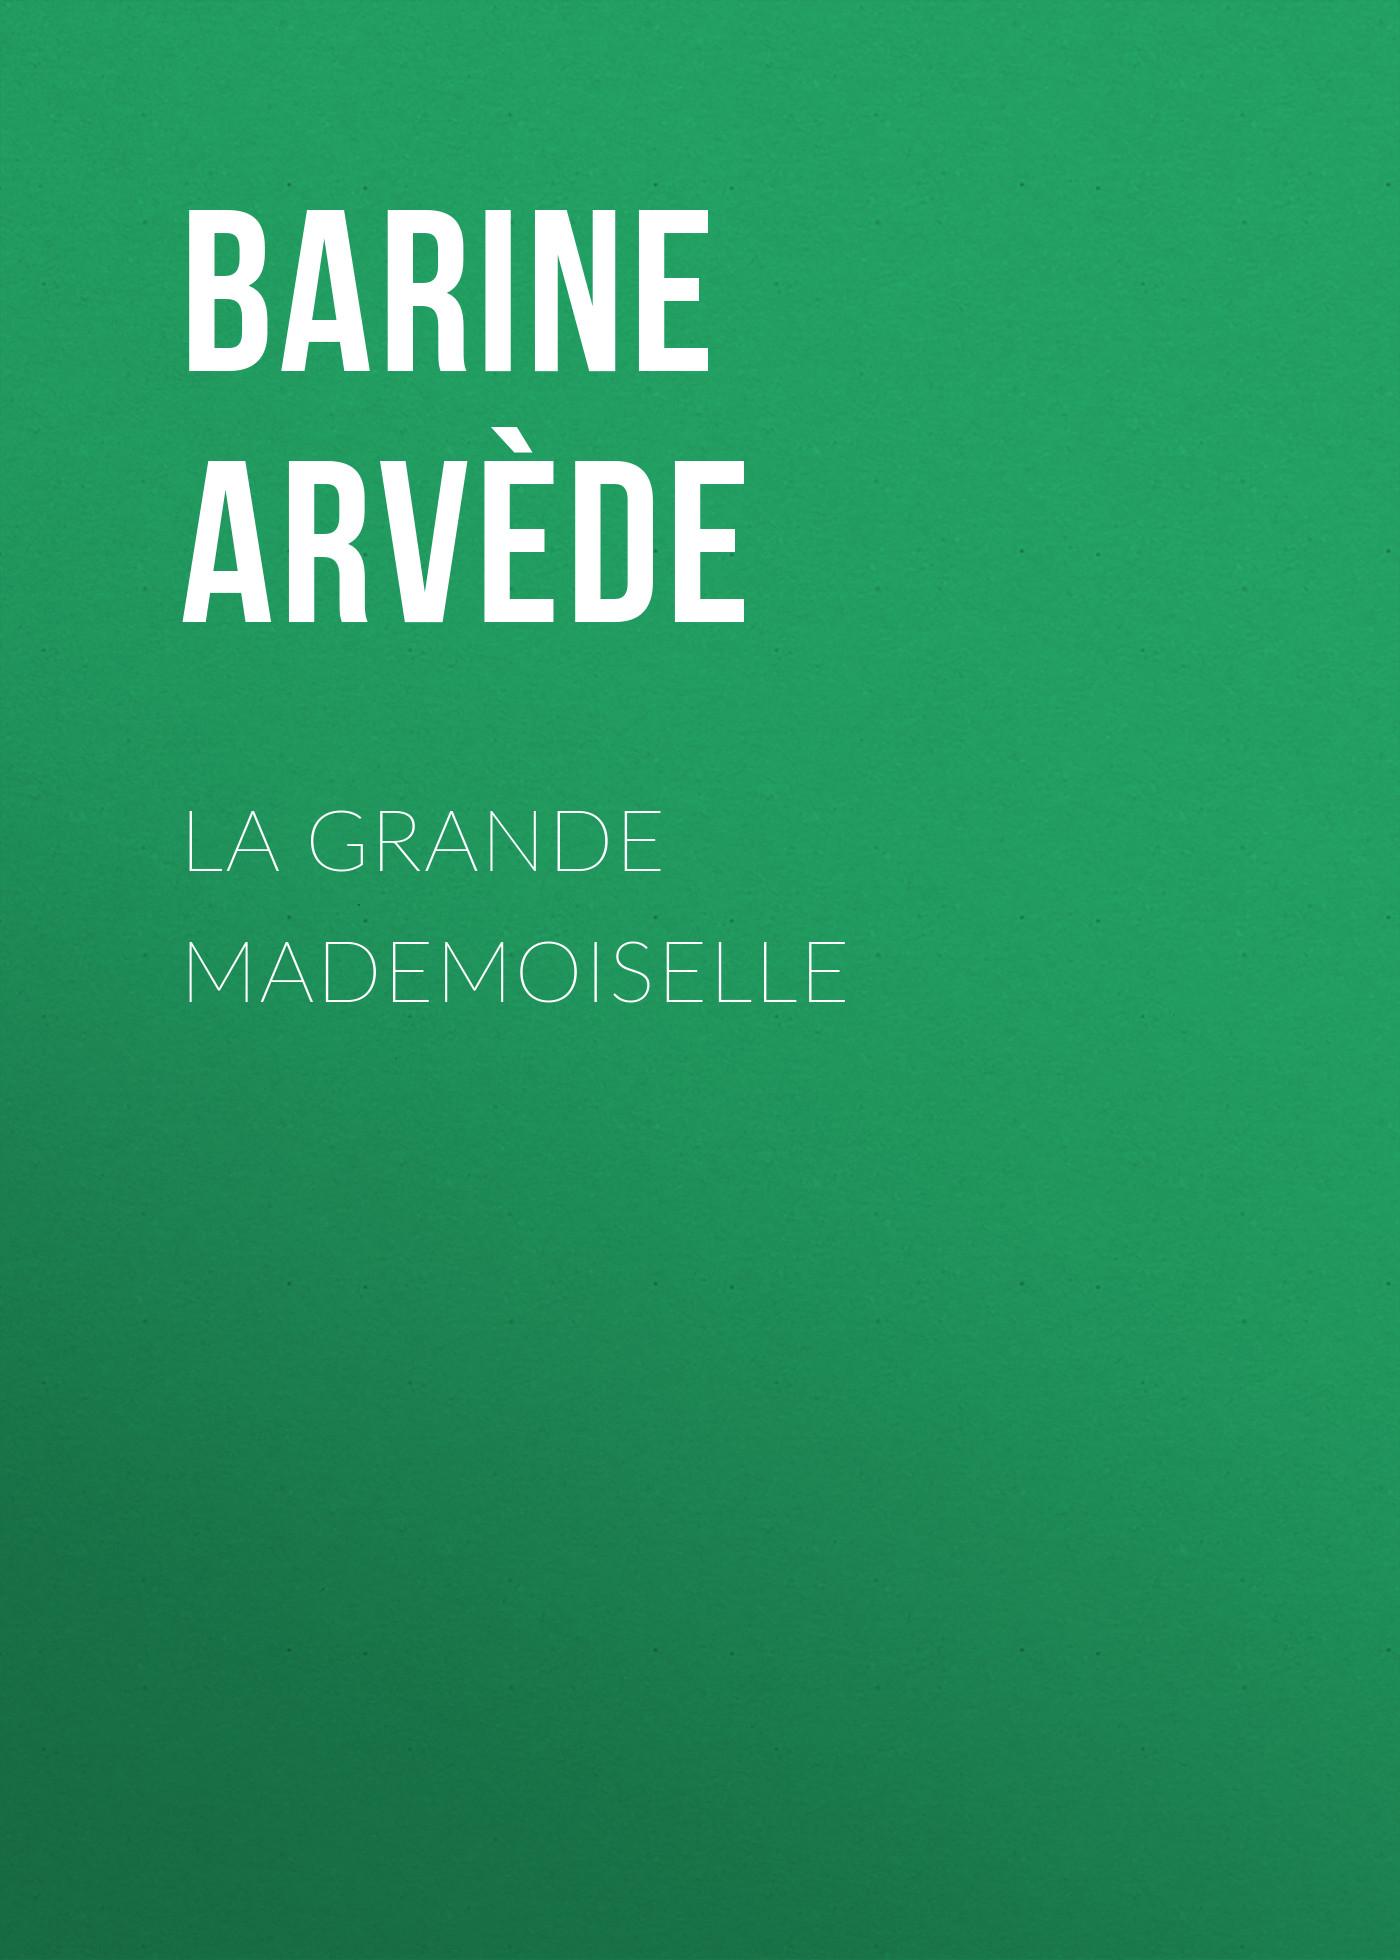 Barine Arvède La Grande Mademoiselle vanessa vale la novia reticente letra grande